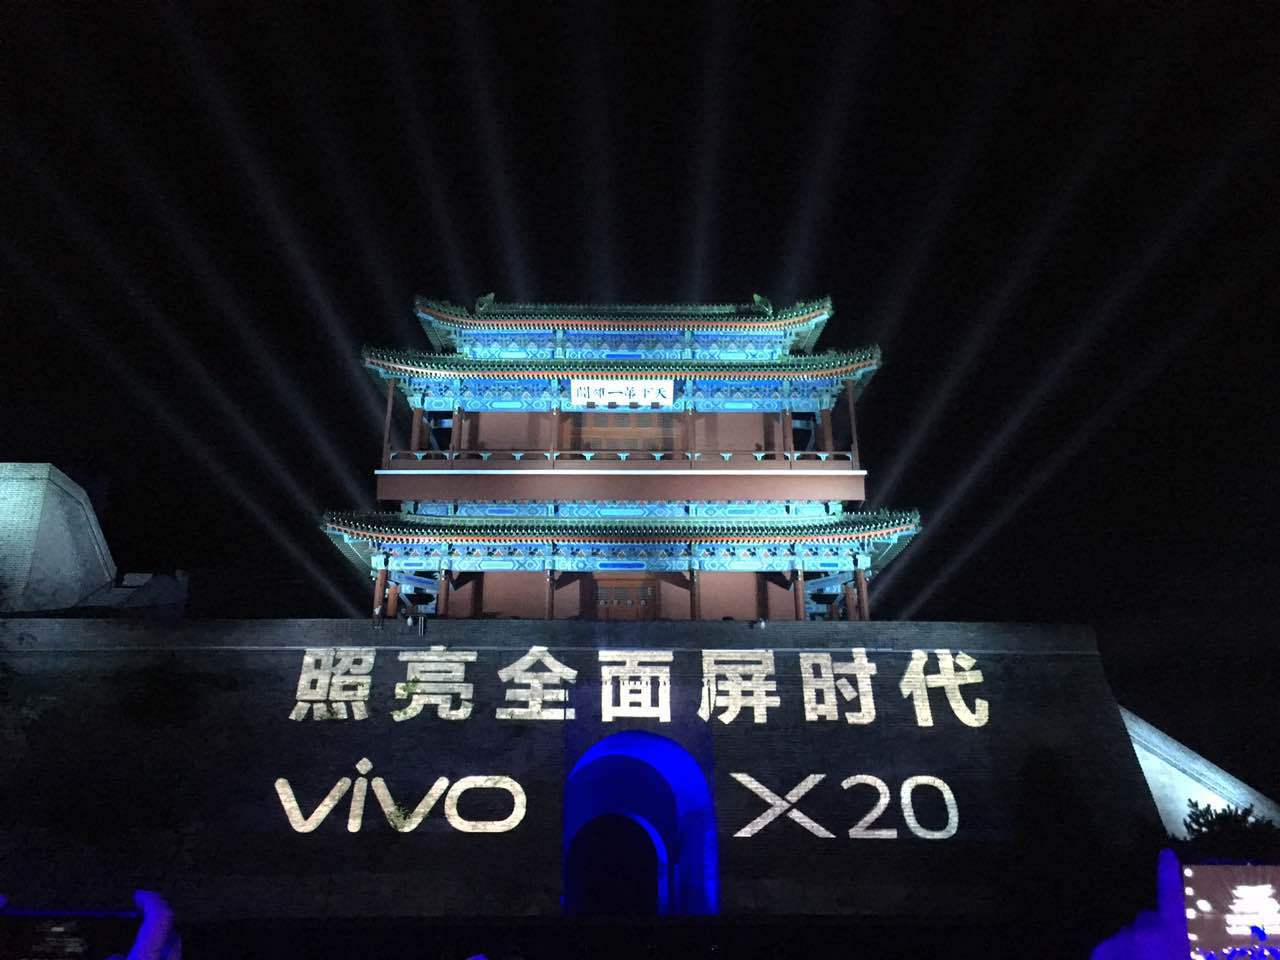 首批备货350万 vivo X20全面屏、AI售价2998元起